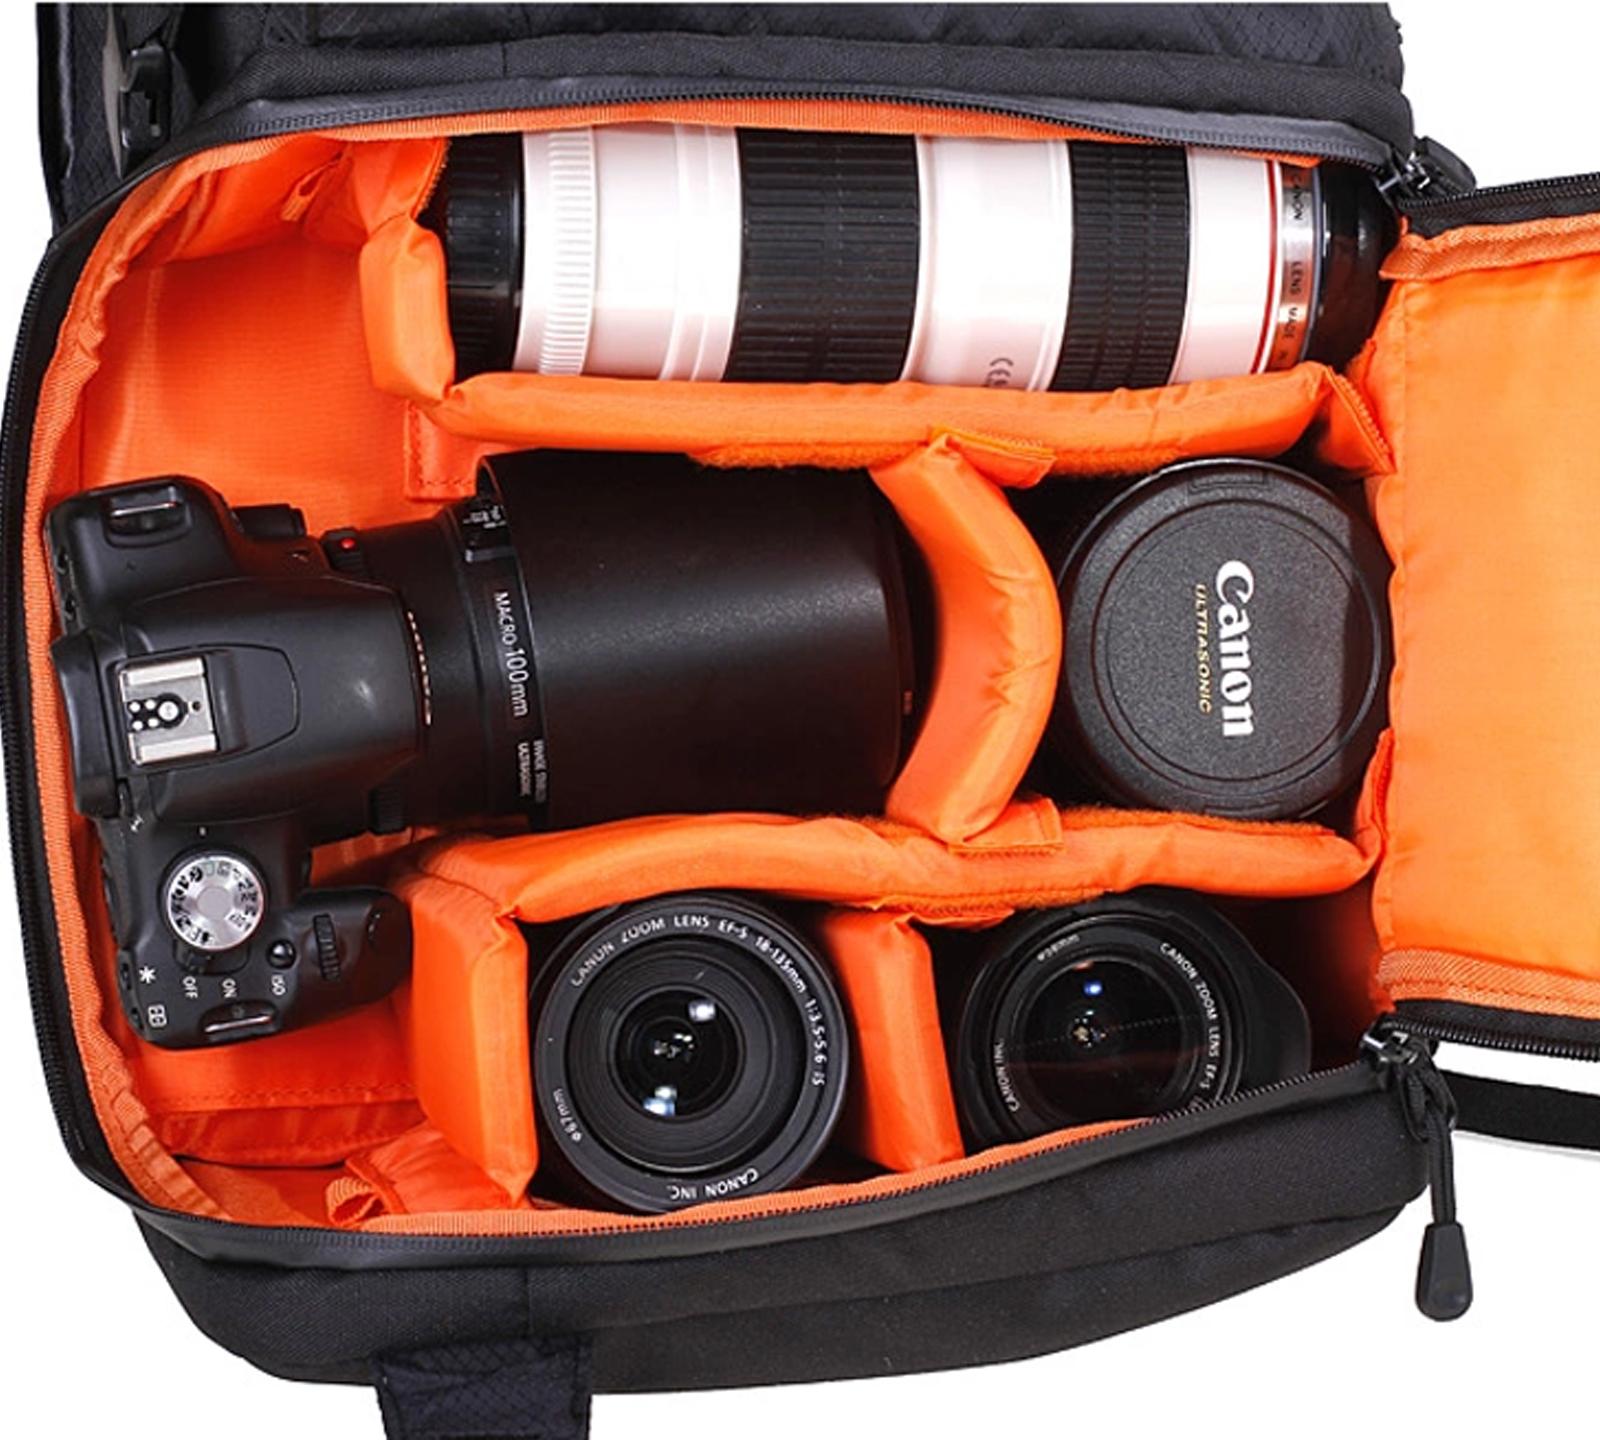 dslr waterproof camera backpack bag case for canon nikon sony weather cover ebay. Black Bedroom Furniture Sets. Home Design Ideas